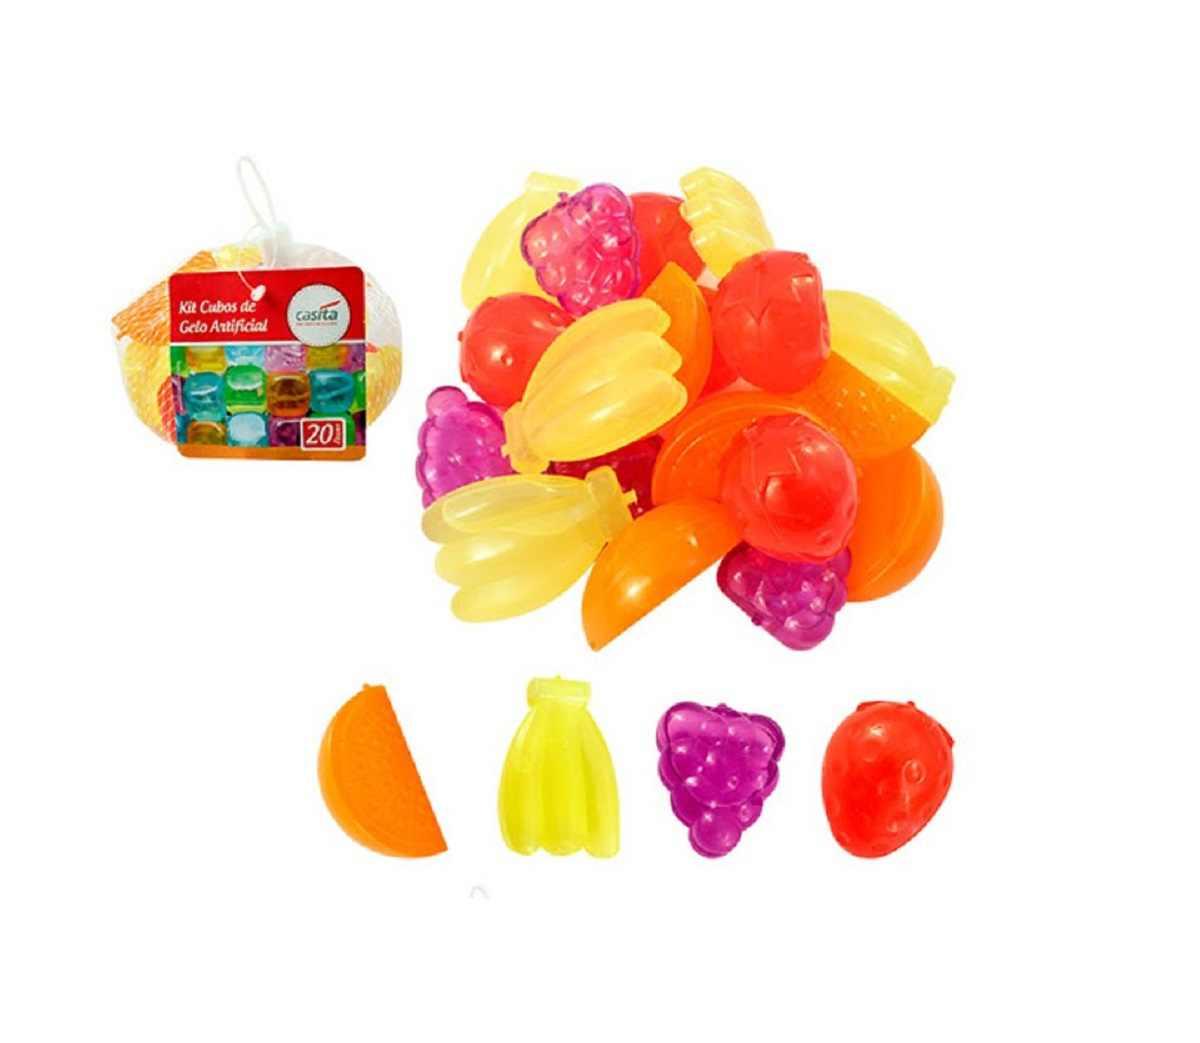 Kit Com 20 Cubos De Gelo Artificial Frutas Plástico Casíta